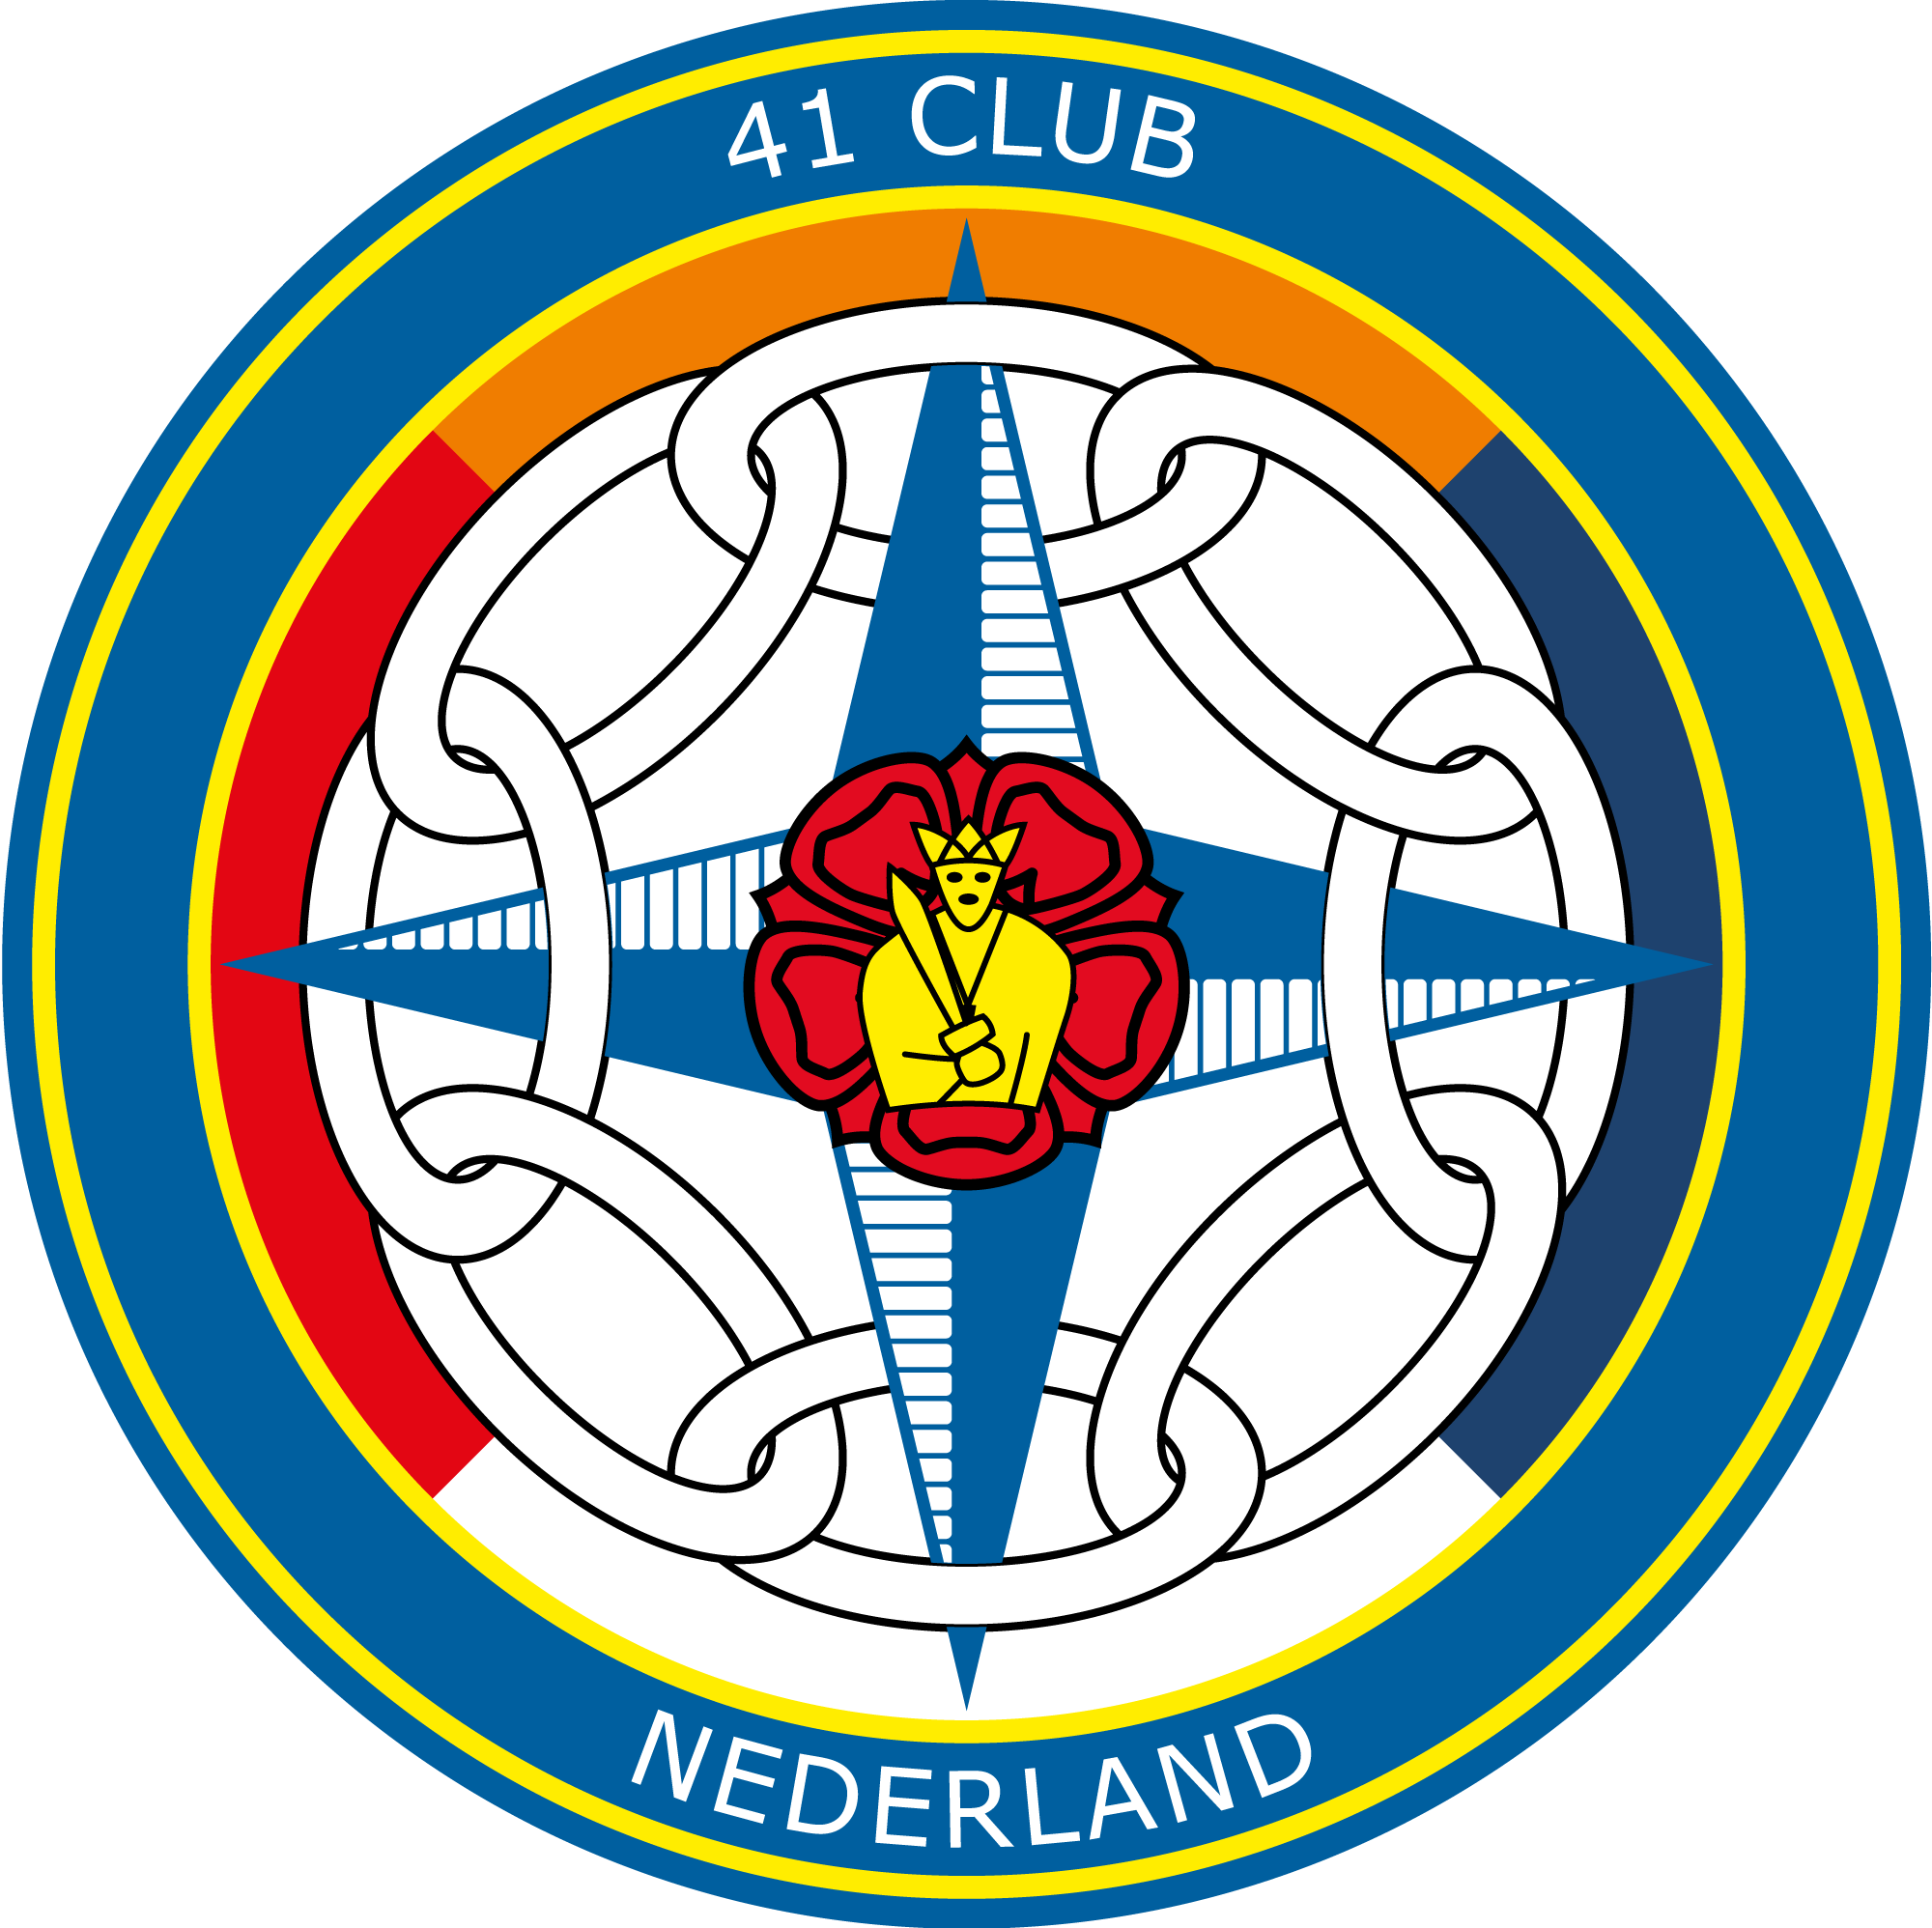 Ronde Tafel Club.41 Club Roermond Official Website Of 41 Club Roermond